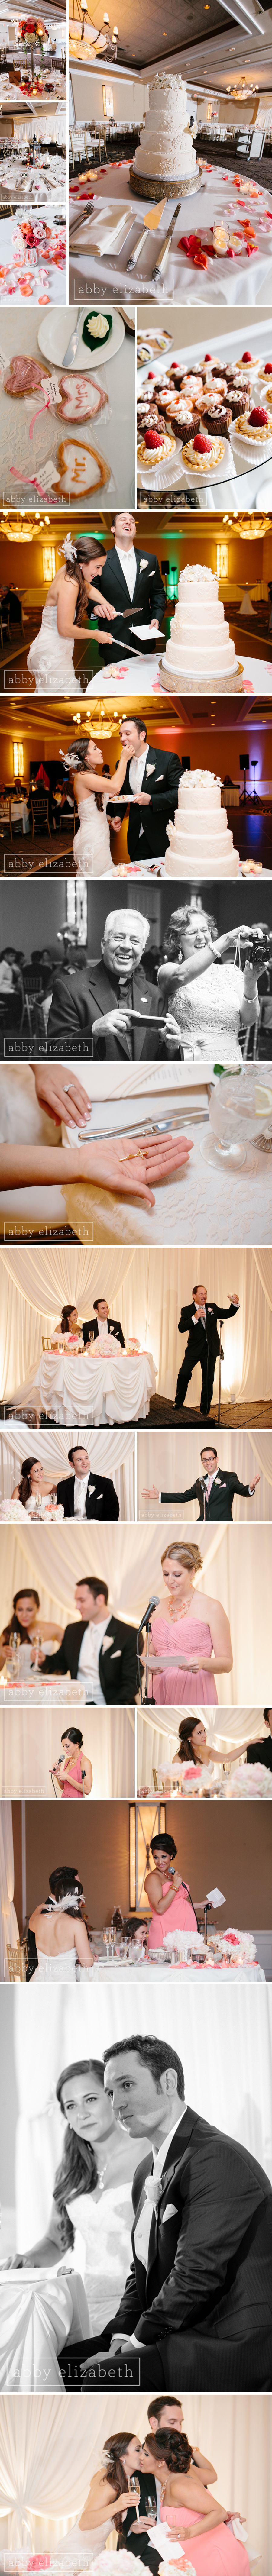 Chicago_Vineyard_Wedding_Abby_Elizabeth_Photography_blog15.jpg